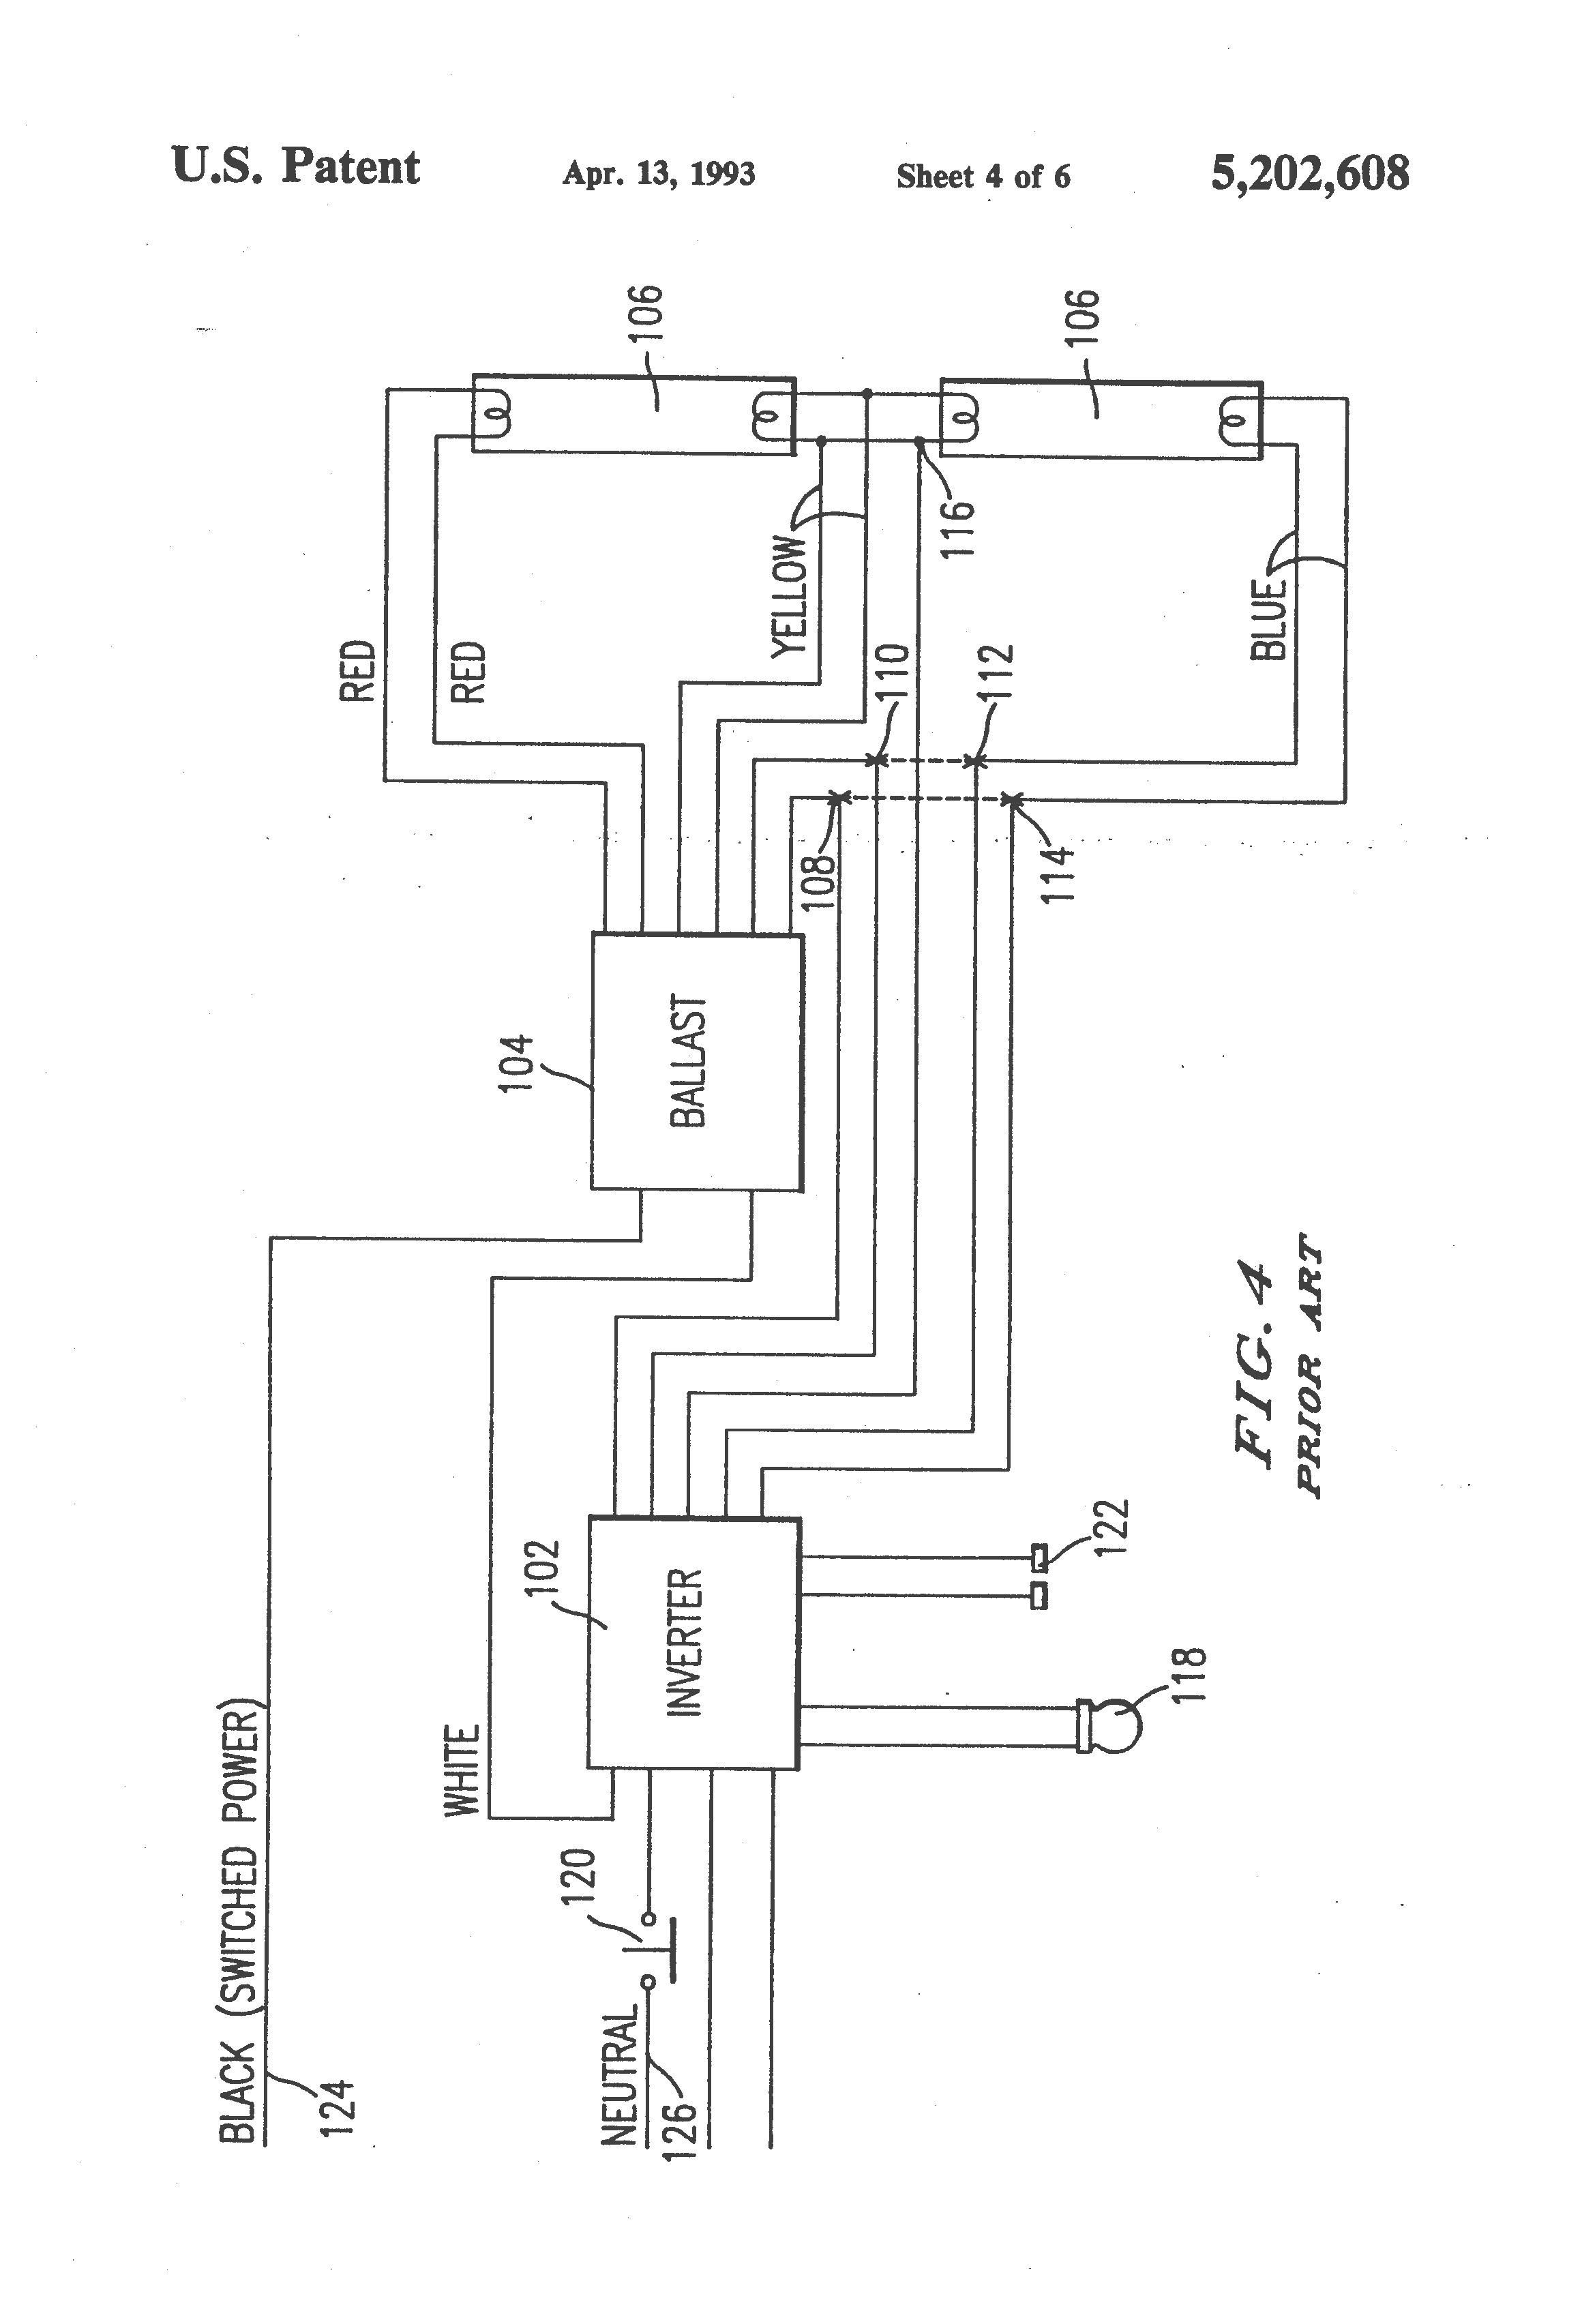 Advance Ballast Kit Wiring Diagram   Wiring Diagram - Philips Advance Ballast Wiring Diagram